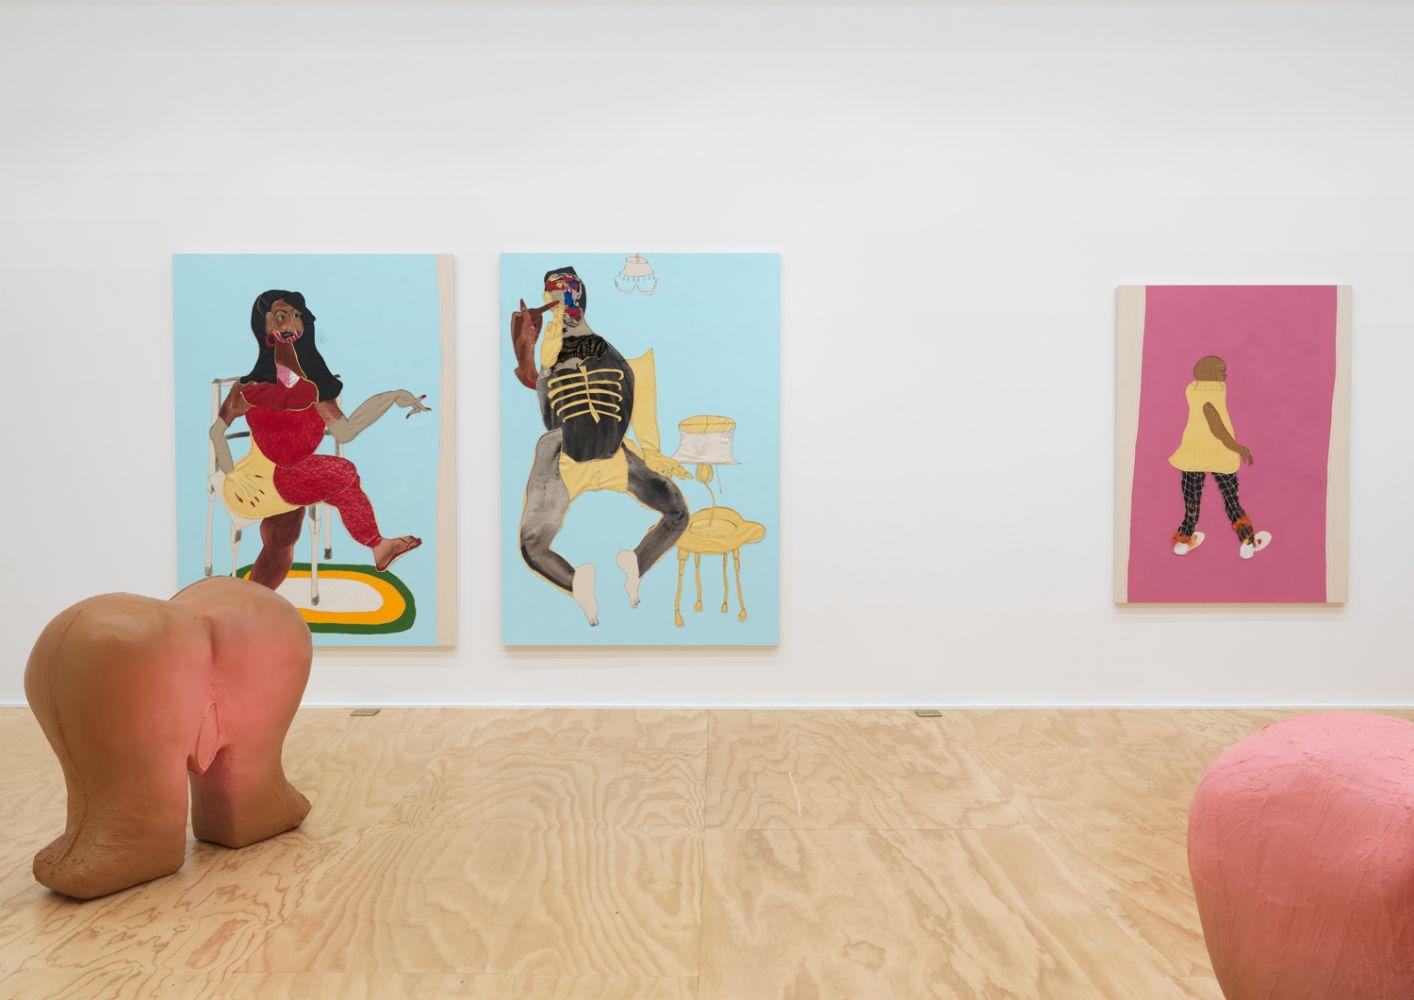 Exhibition View, Tschabalala Self, Cotton Mouth, Eva Presenhuber, New York, 2020 install 12